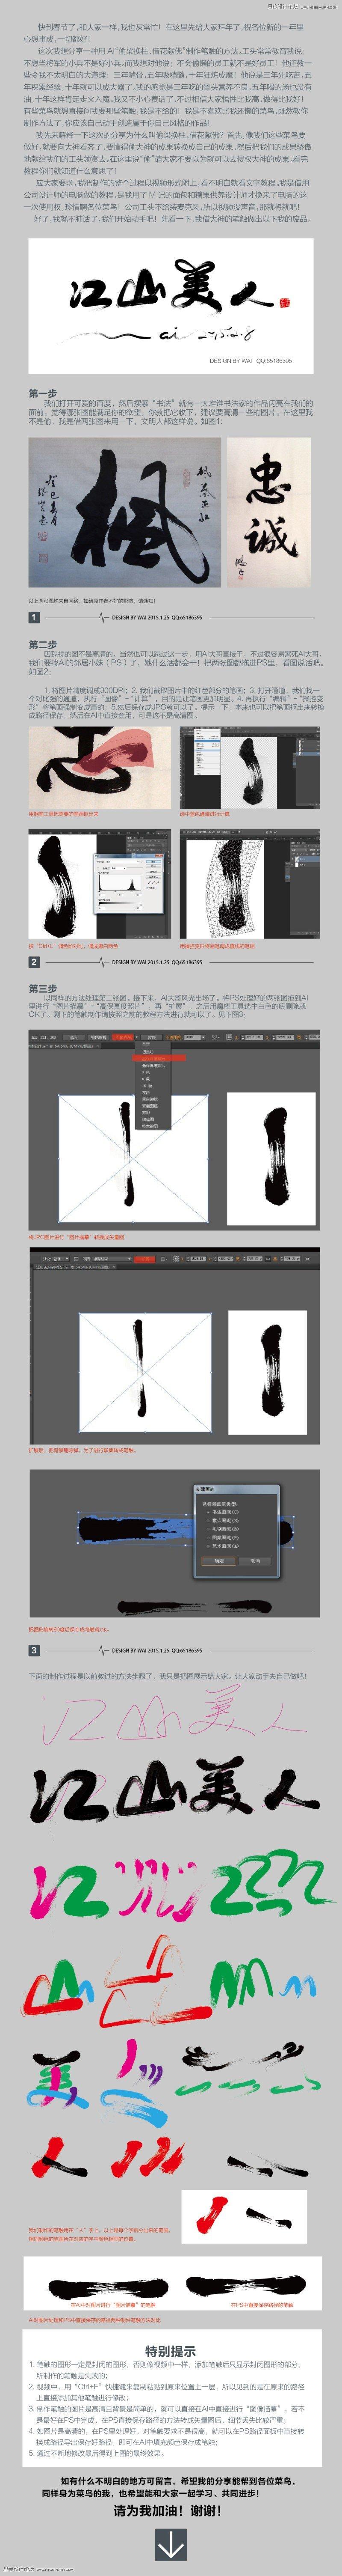 Illustrator设计制作超酷的传统毛笔字教程